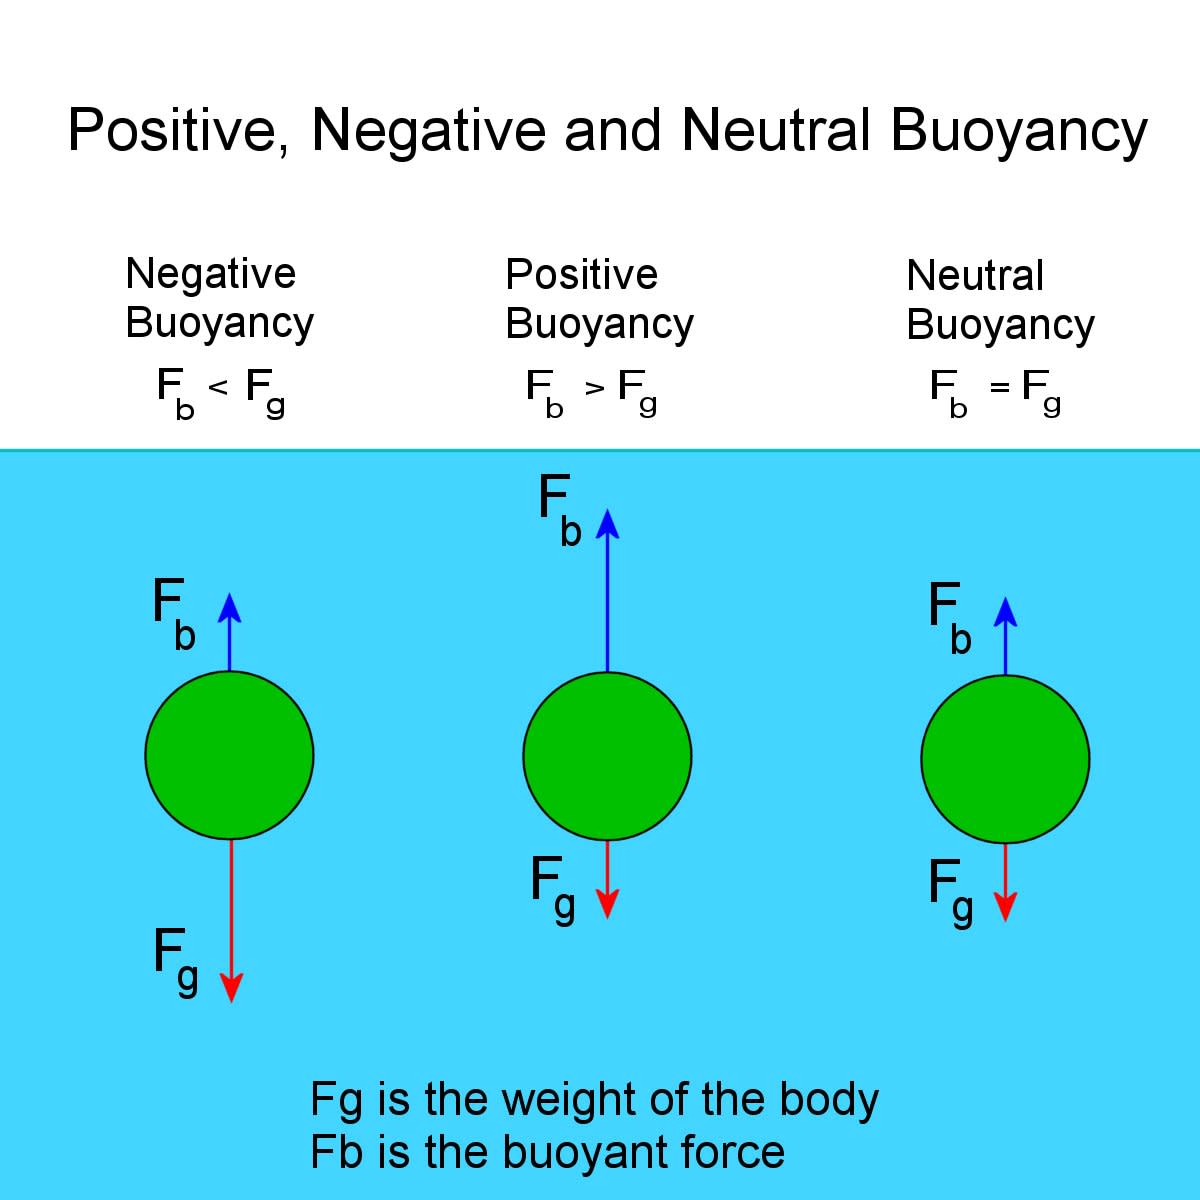 Negative, neutral and positive buoyancy